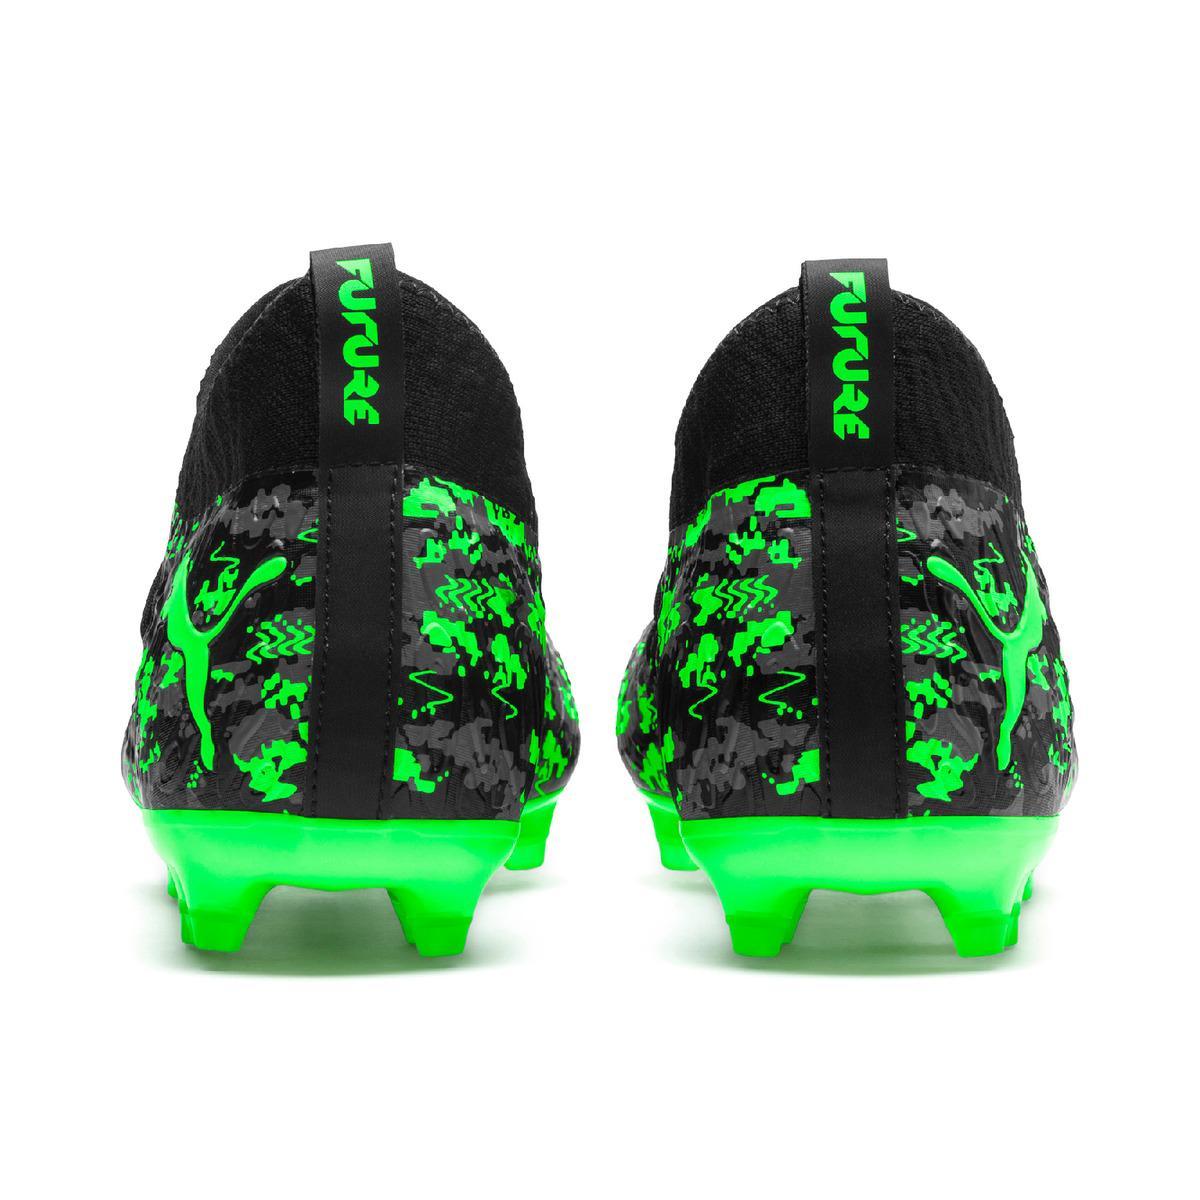 c4c6eb58ea204 Lyst - PUMA Future 19.3 Netfit Fg/ag Footbal Shoes in Green for Men